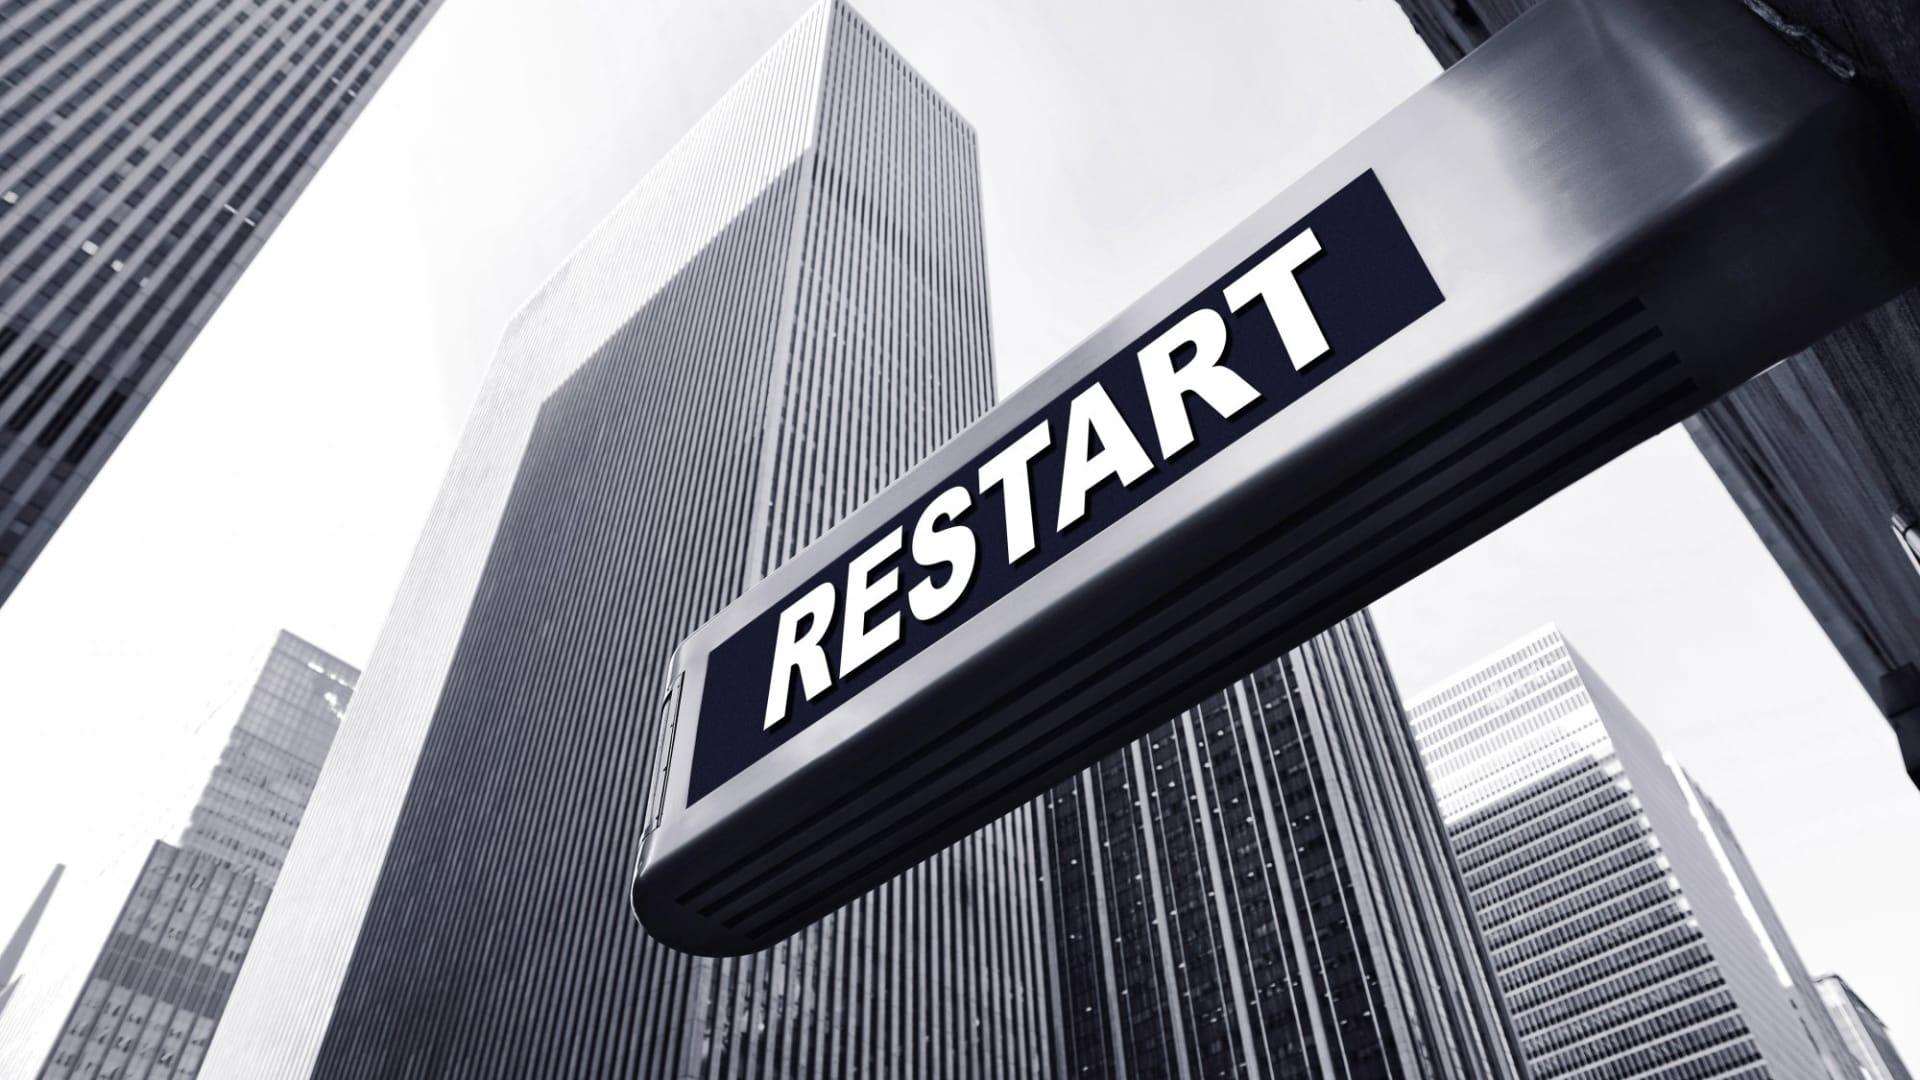 6 Key Drivers of a Restarting Economy